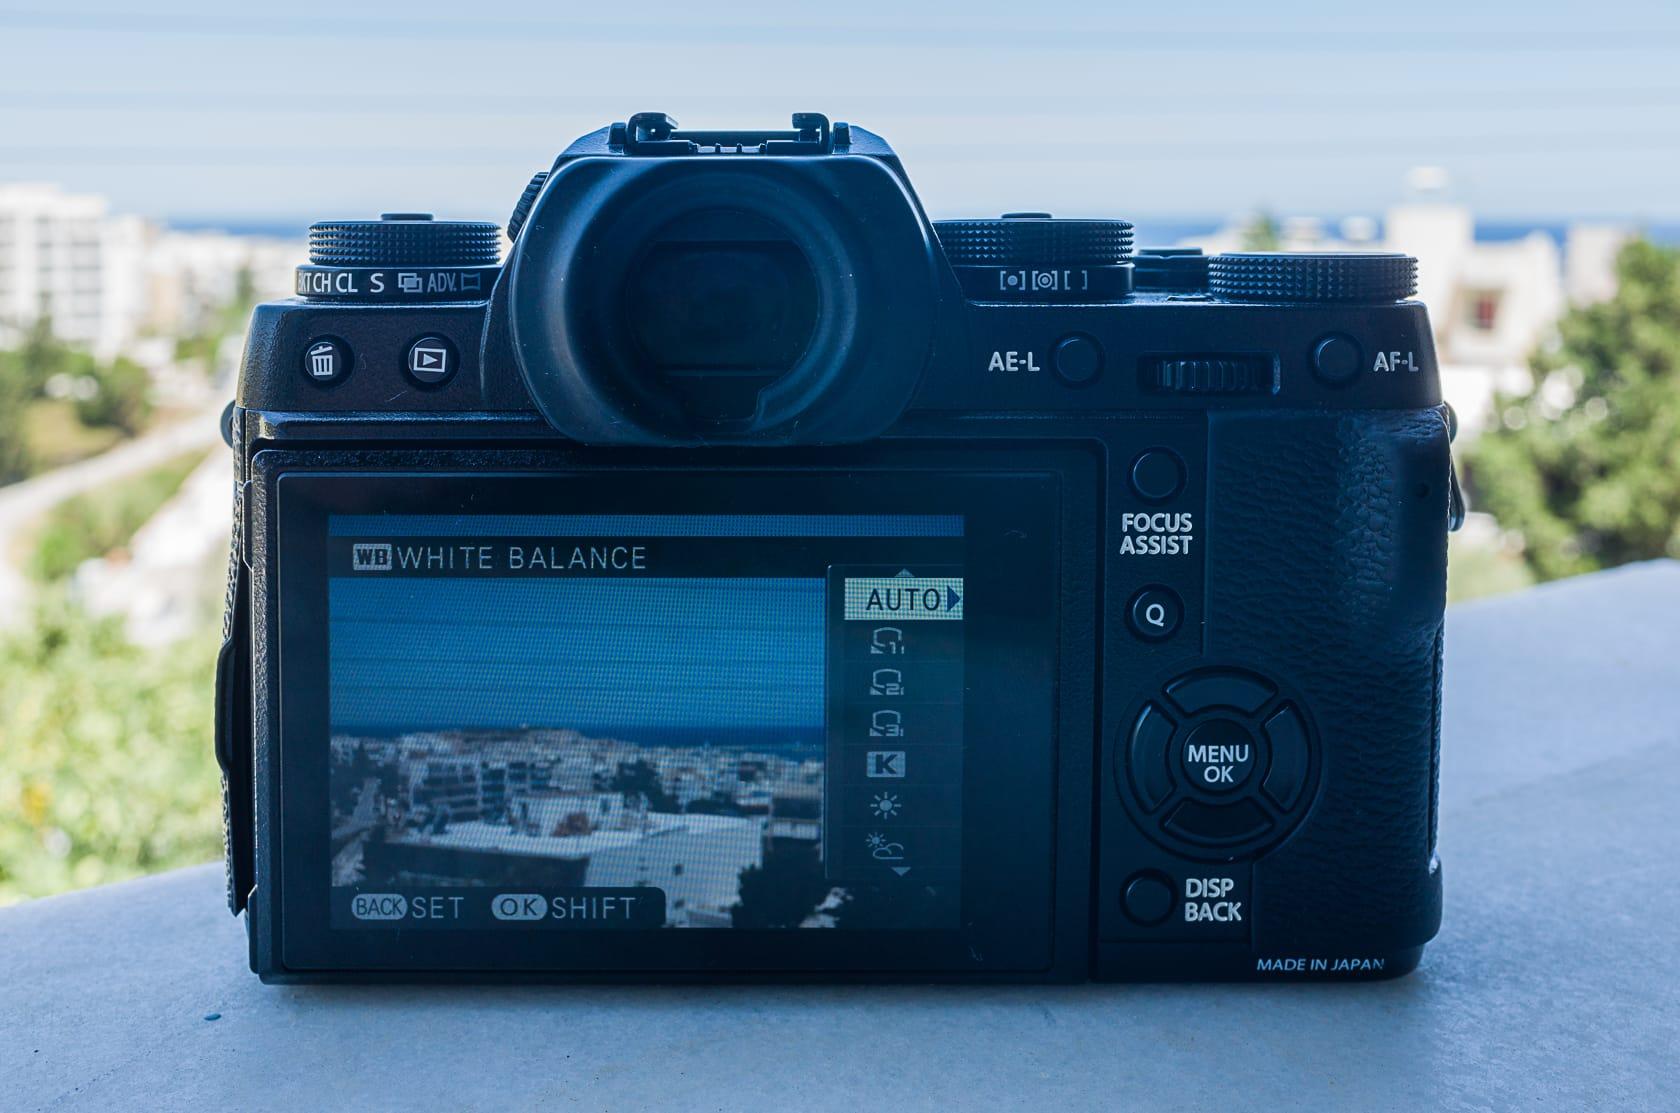 Fujifilm X-T1 LCD screen